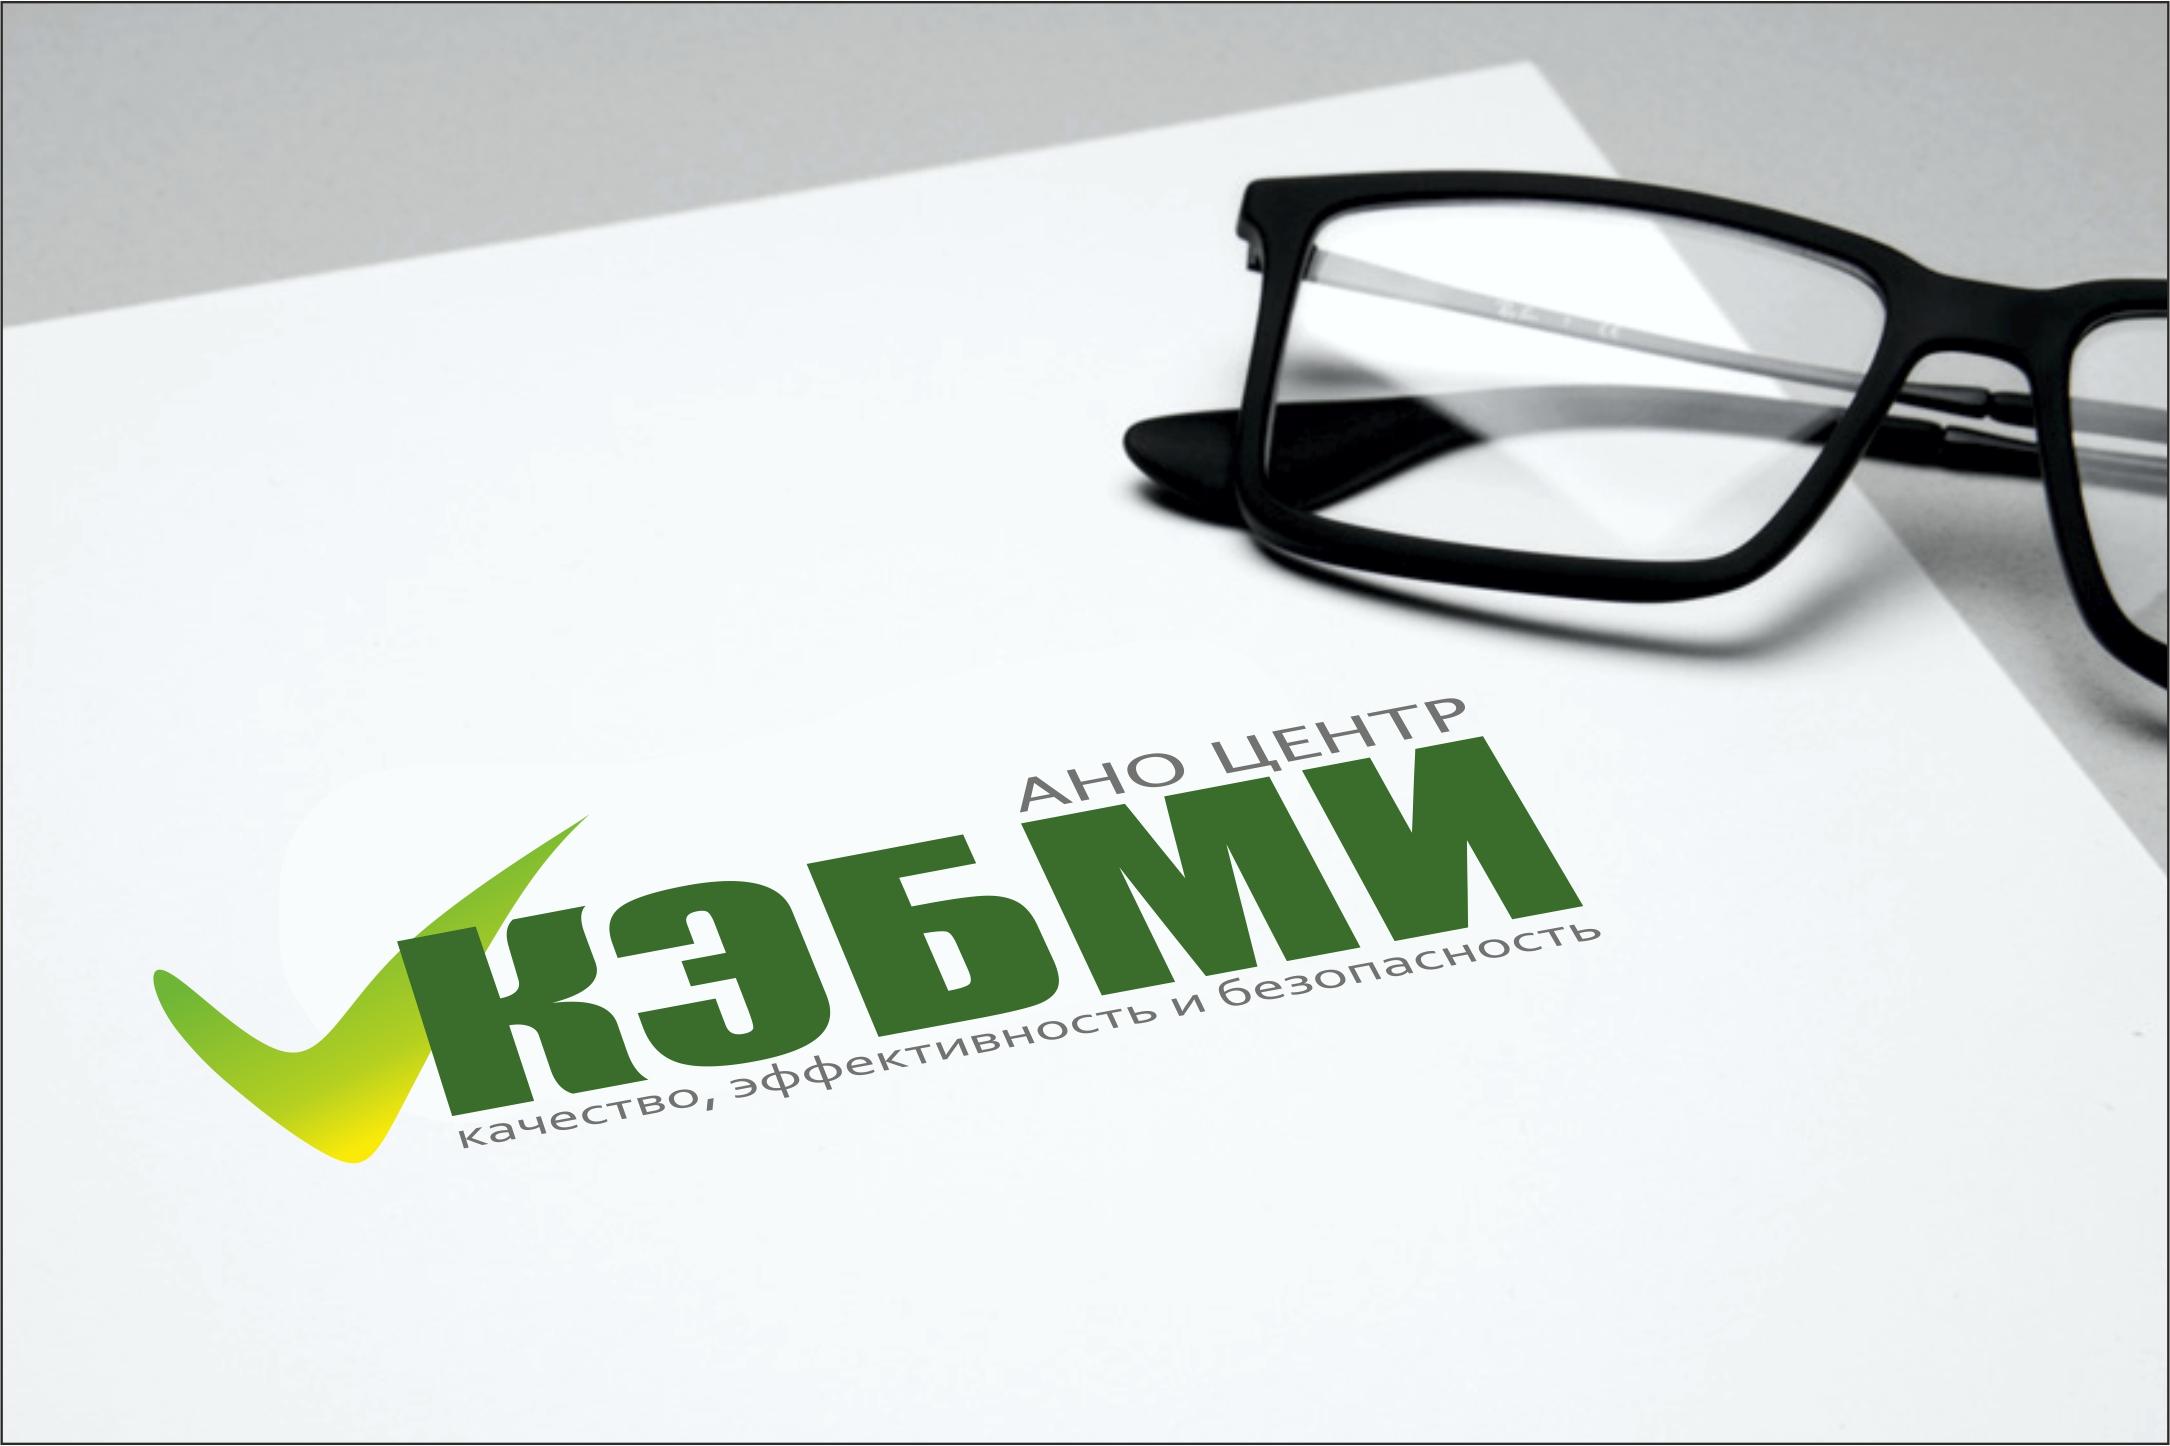 Редизайн логотипа АНО Центр КЭБМИ - BREVIS фото f_9325b1eaa34423dc.jpg